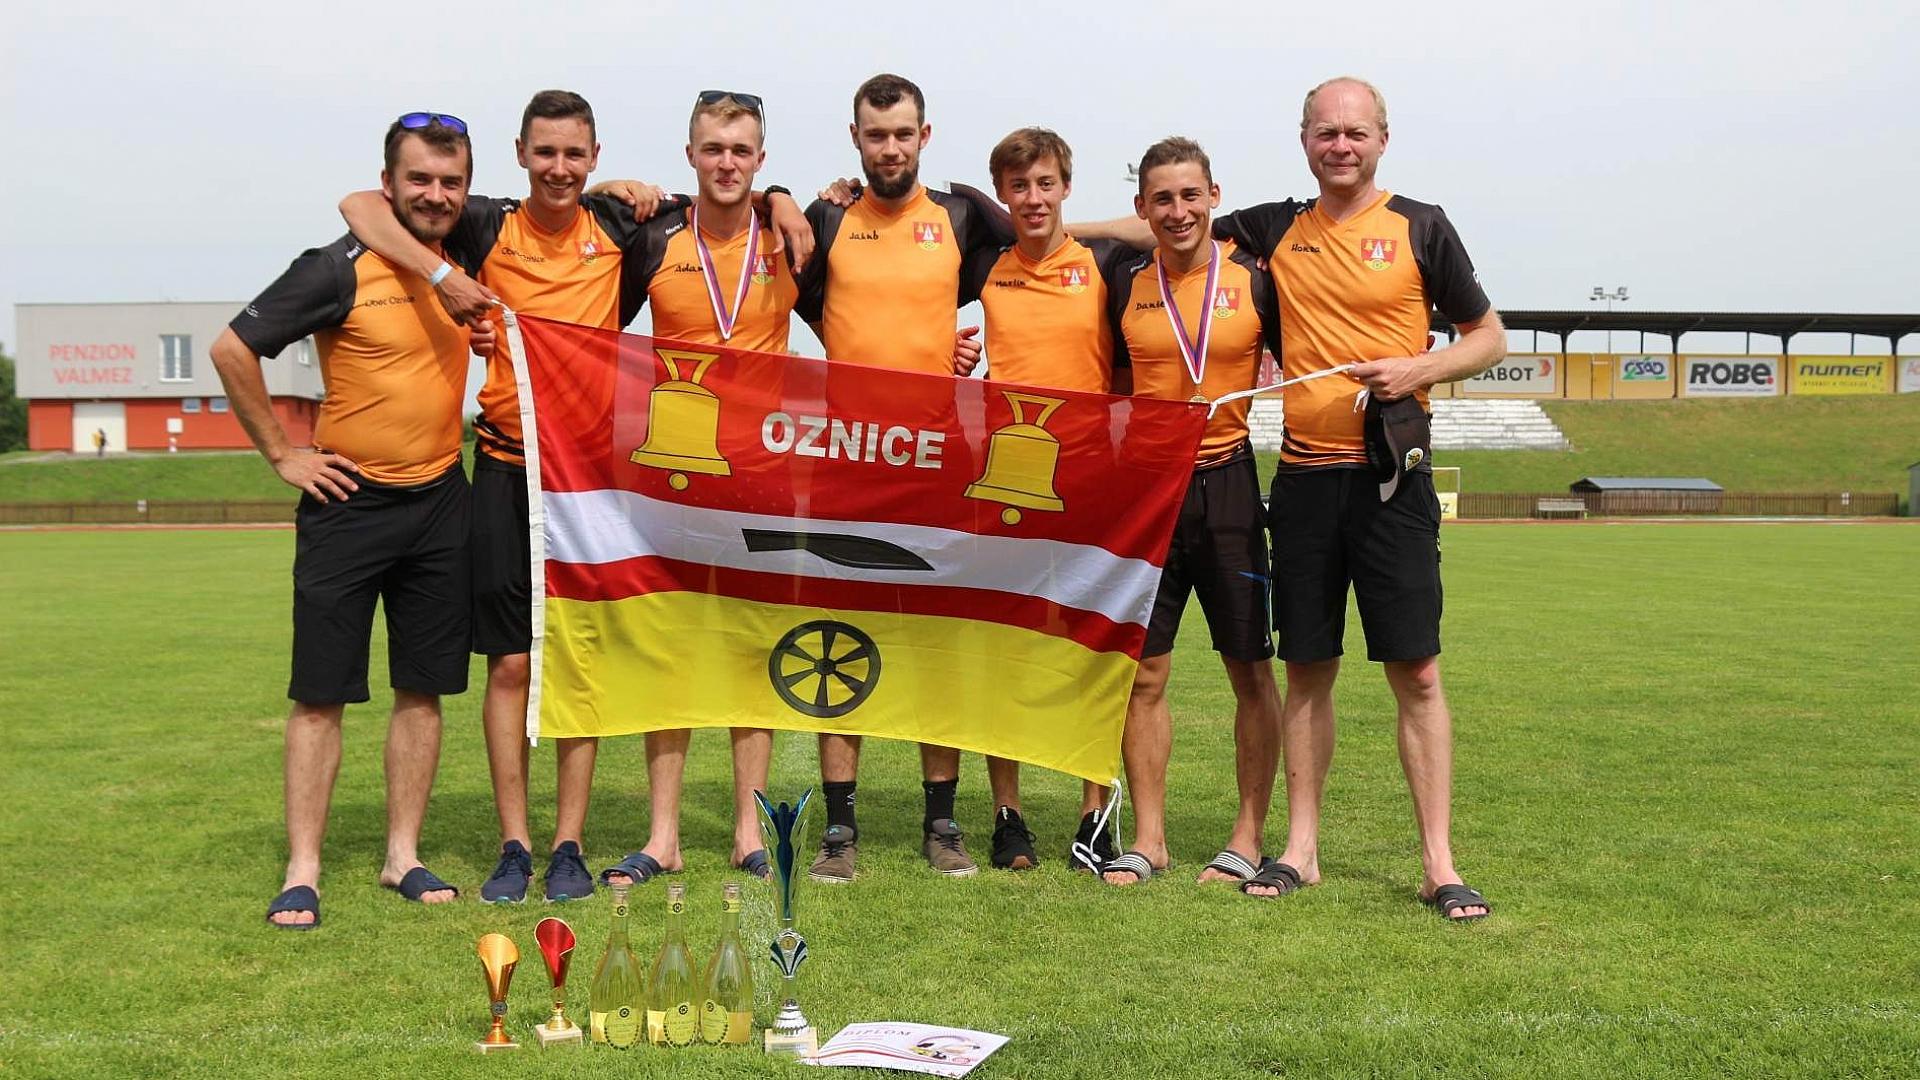 SDH Oznice - Okresní kolo v Požárním sportu Val-Mez 15.6.2019